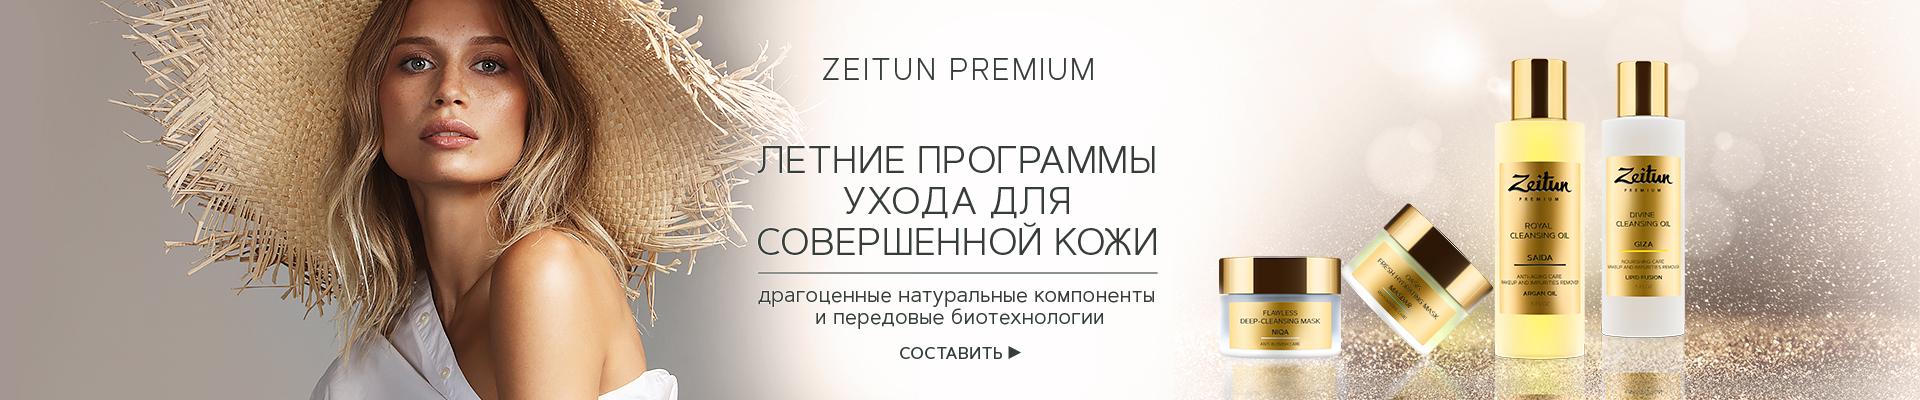 Зейтун